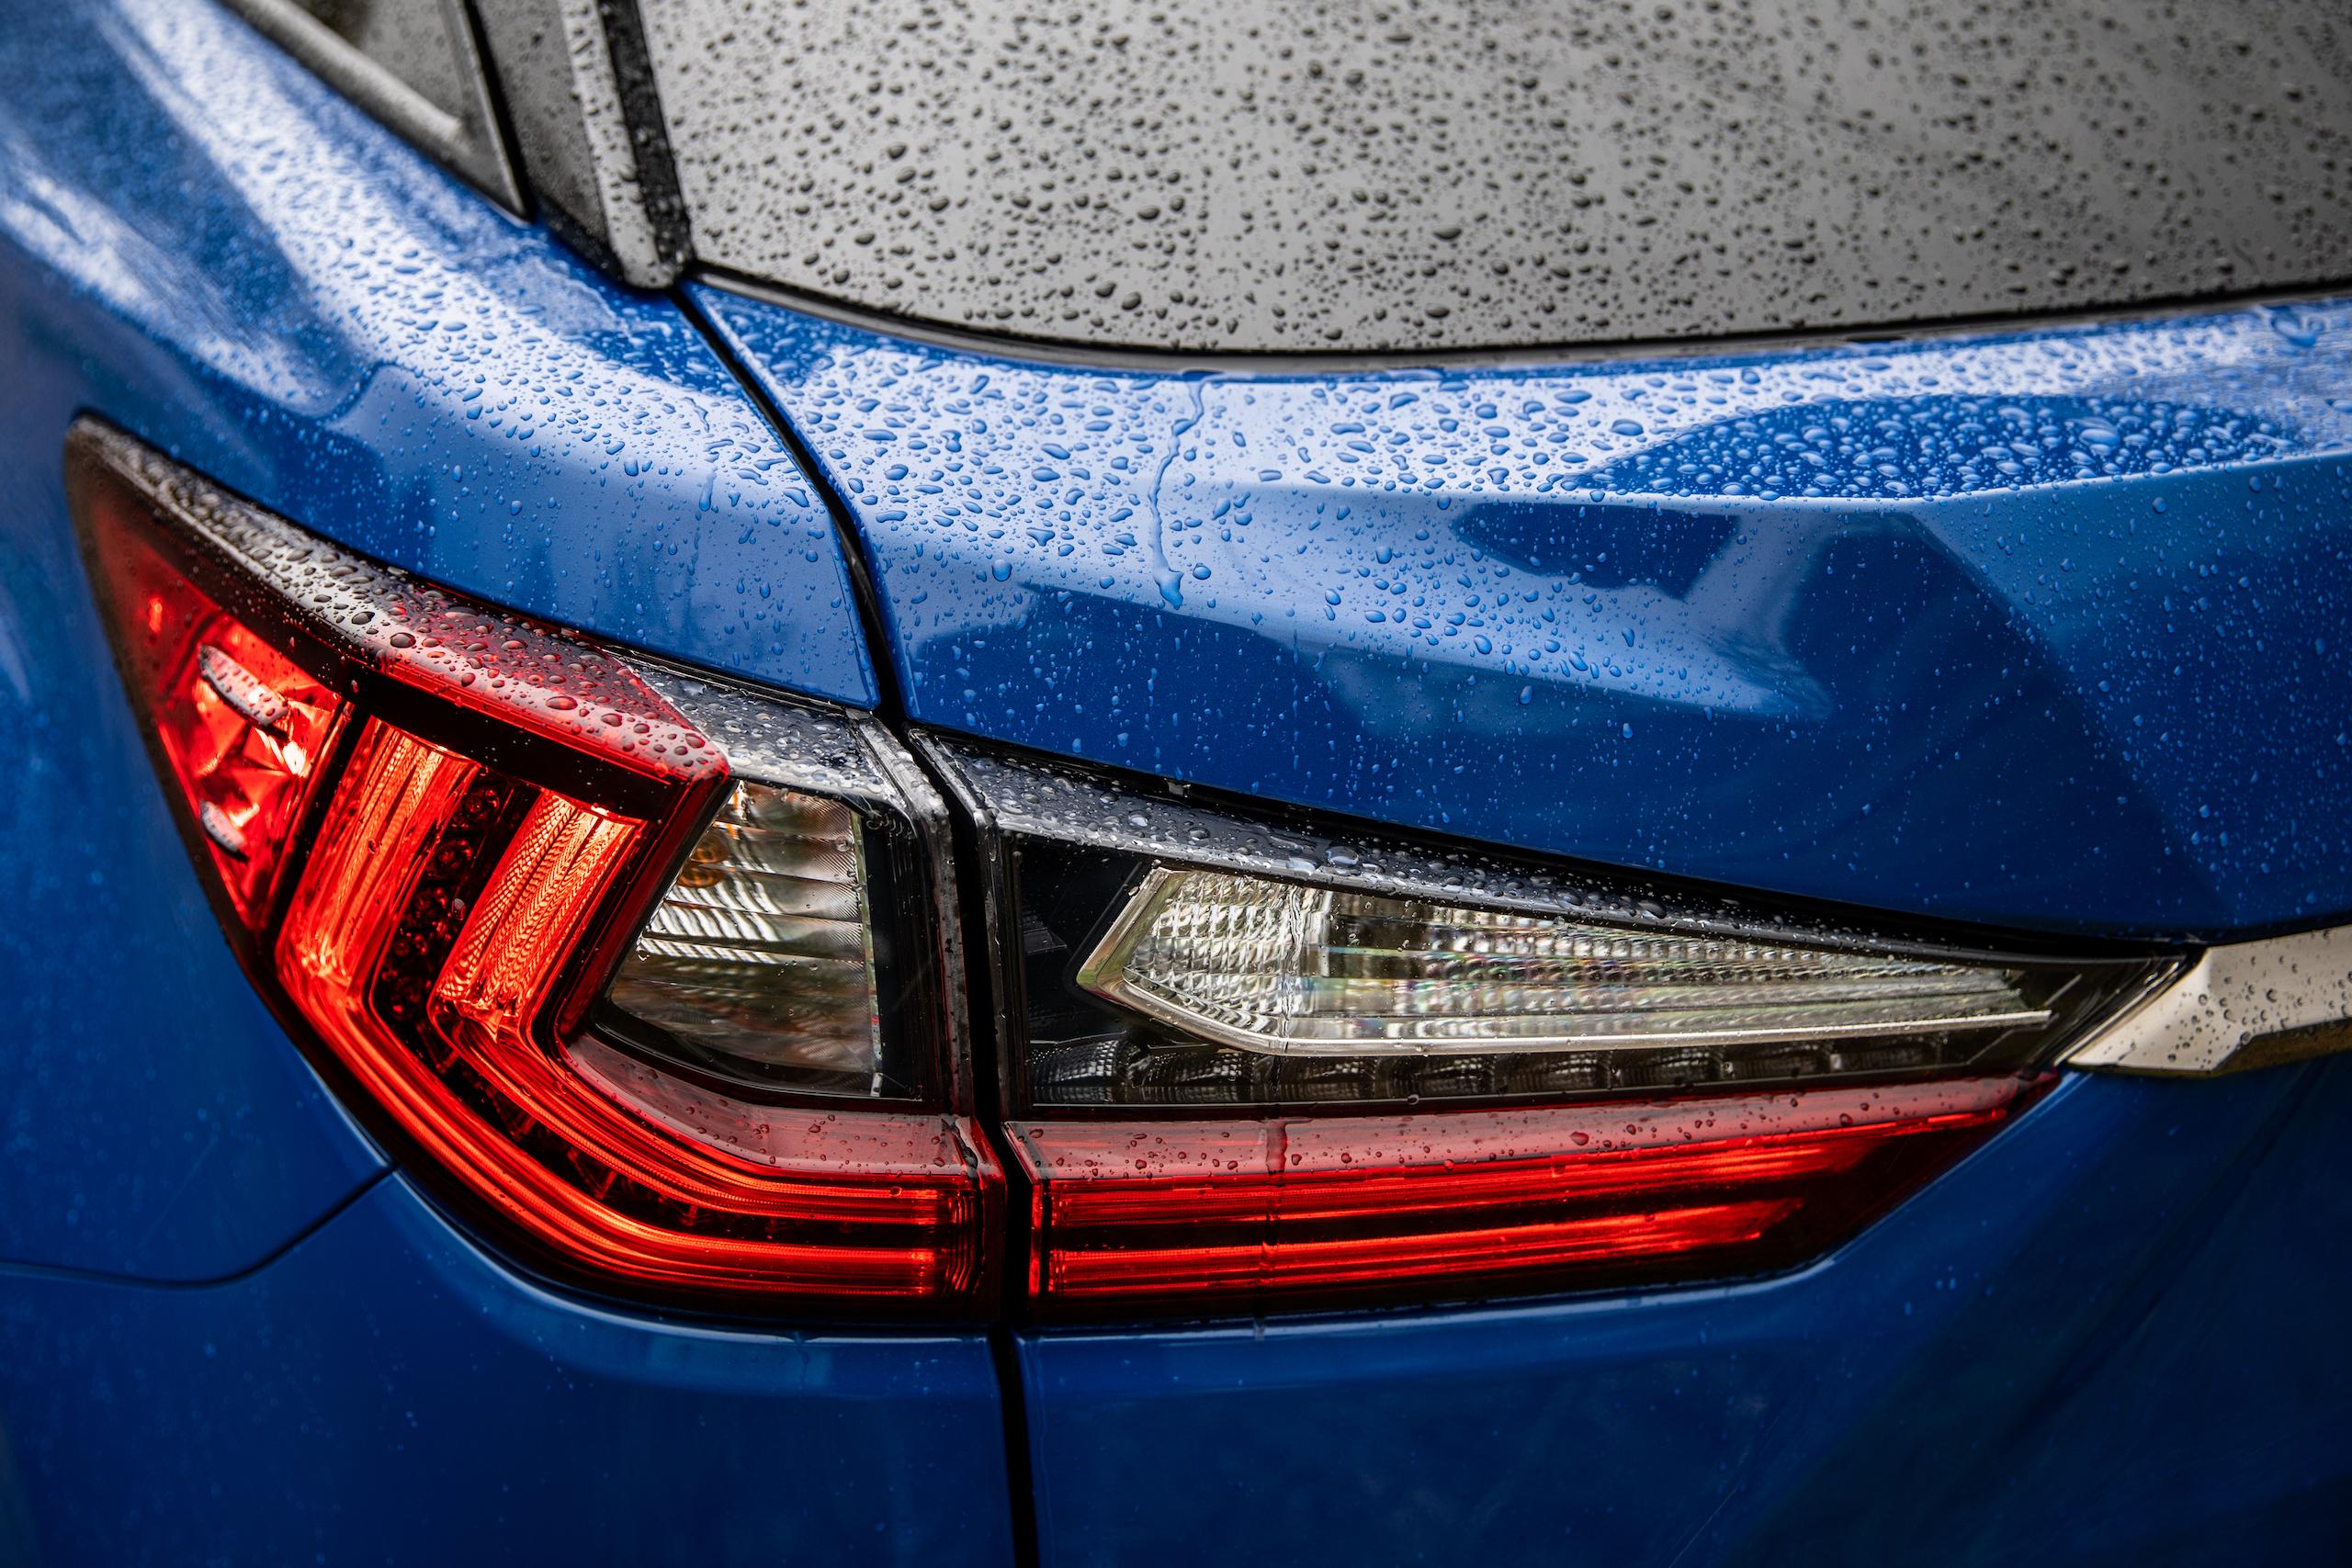 2021 Lexus RX450h rear taillight